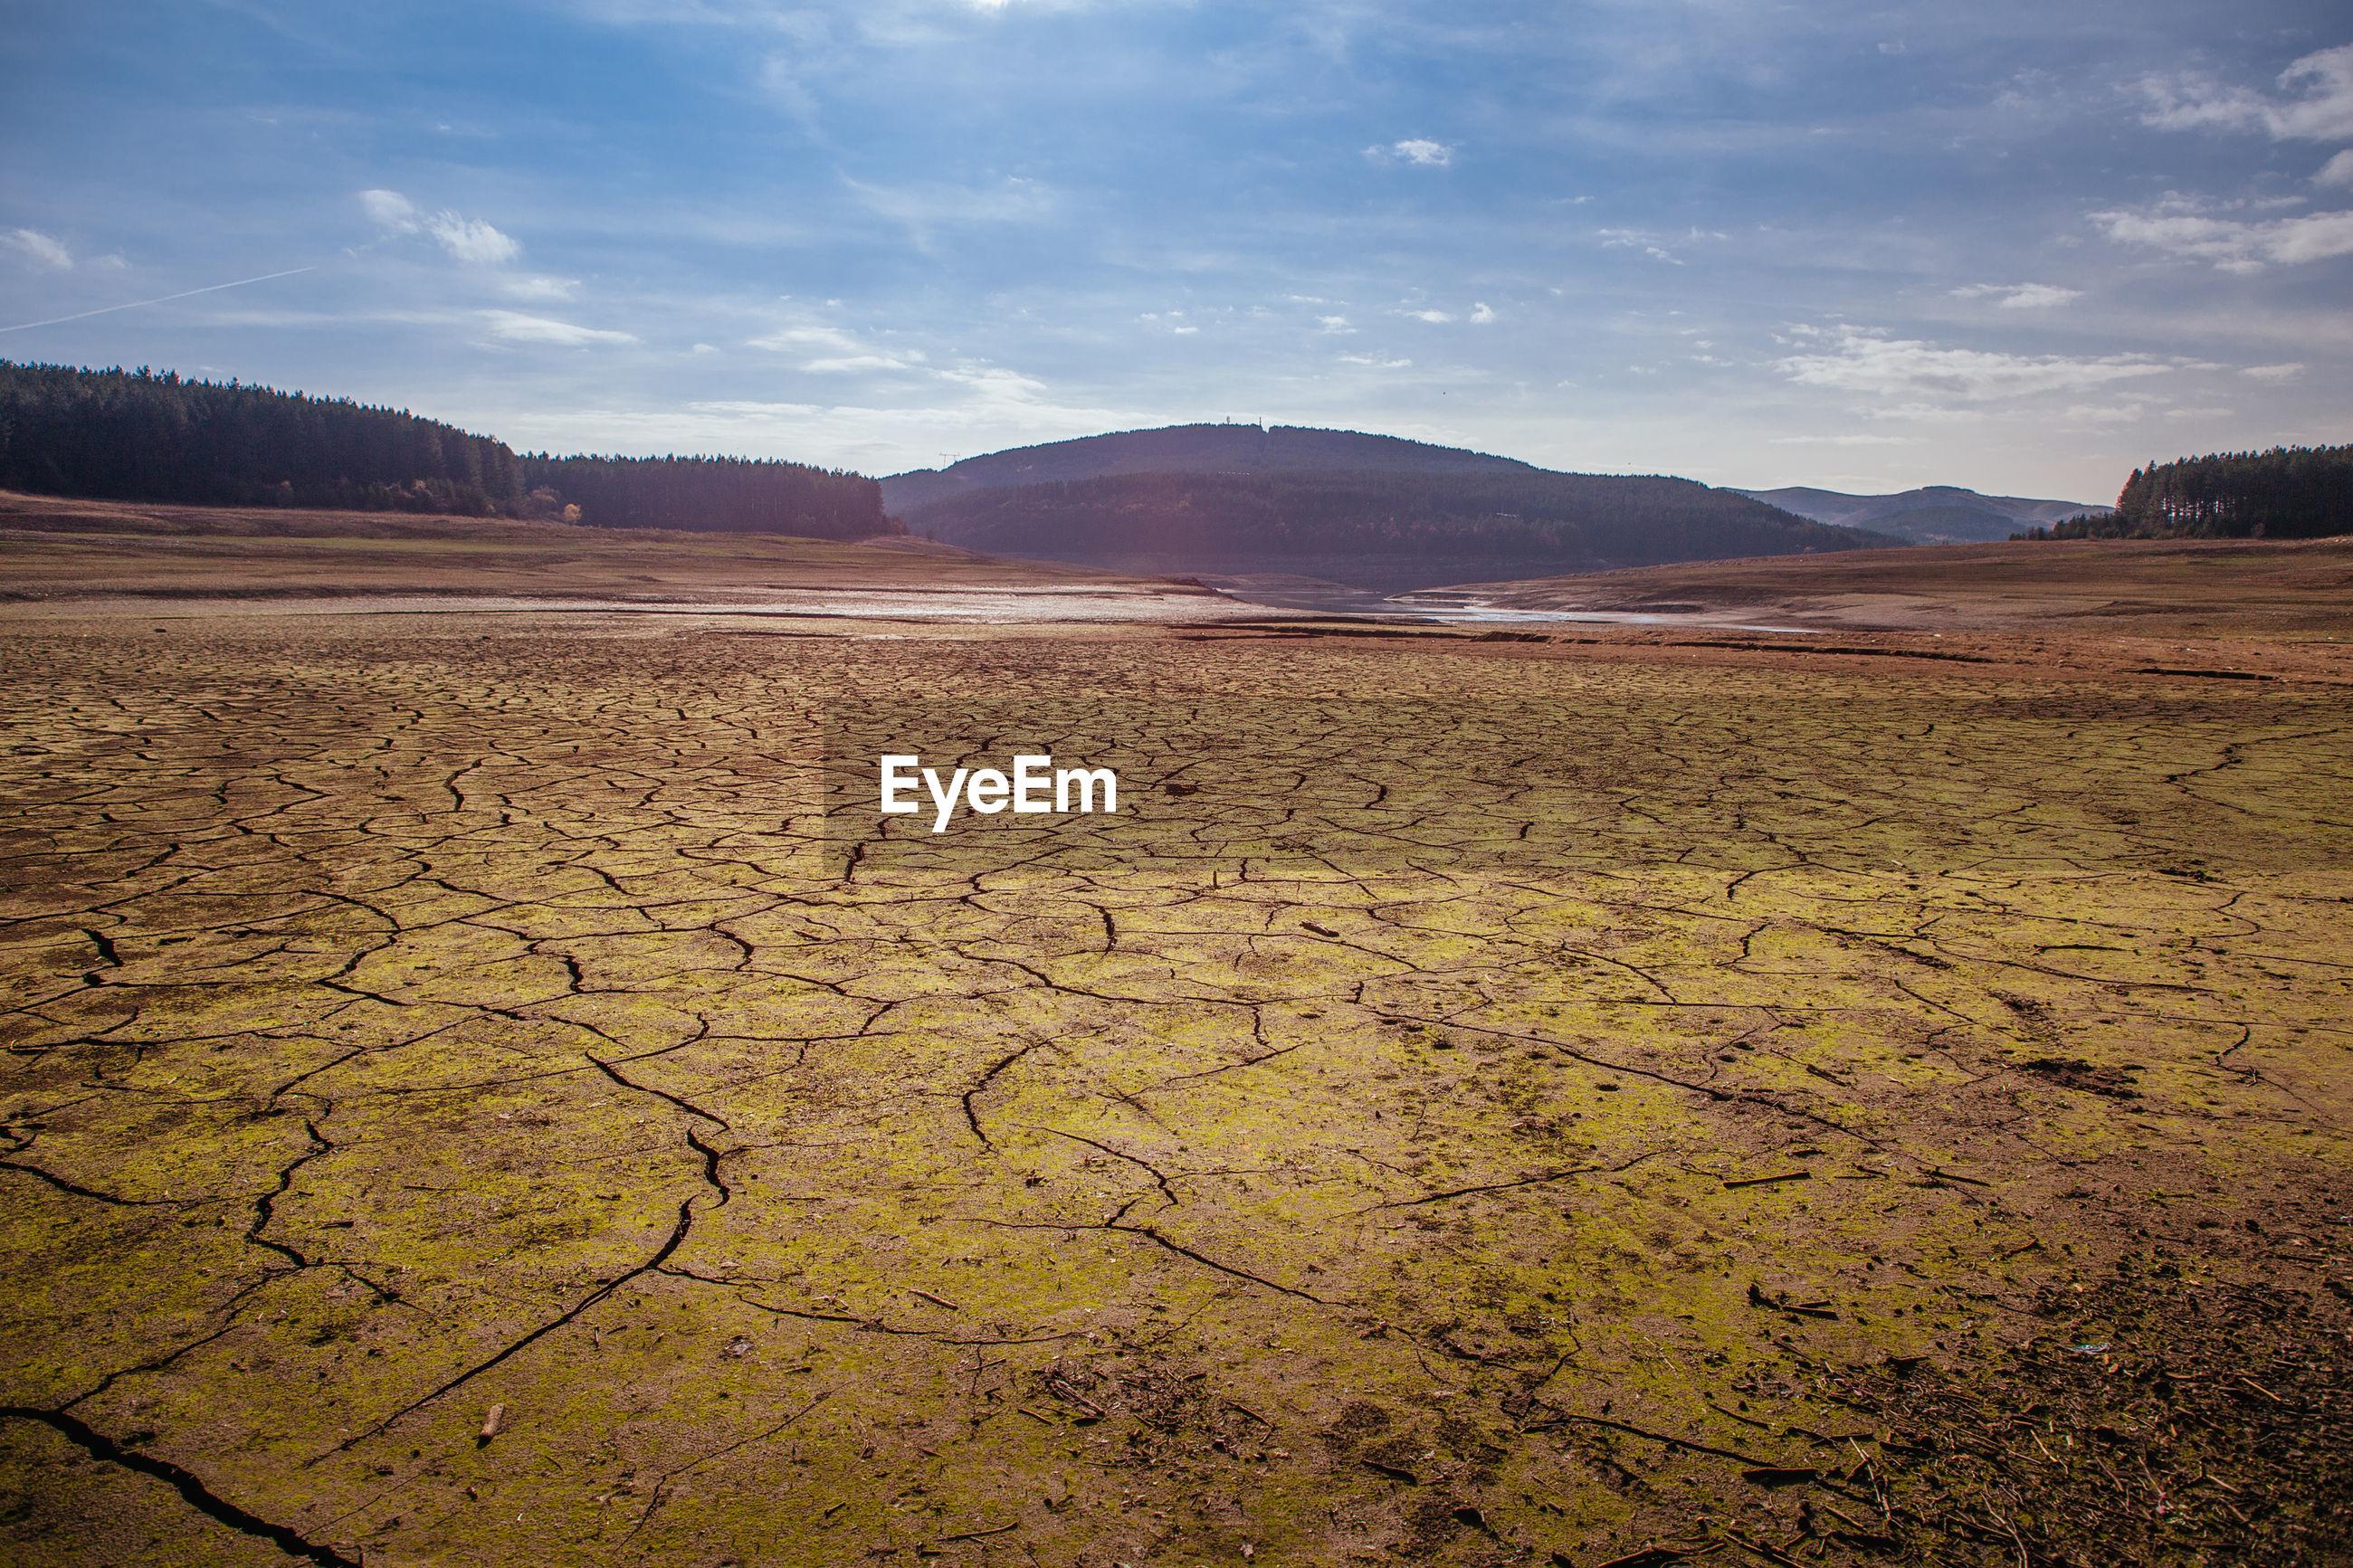 SCENIC VIEW OF BARREN LANDSCAPE AGAINST SKY